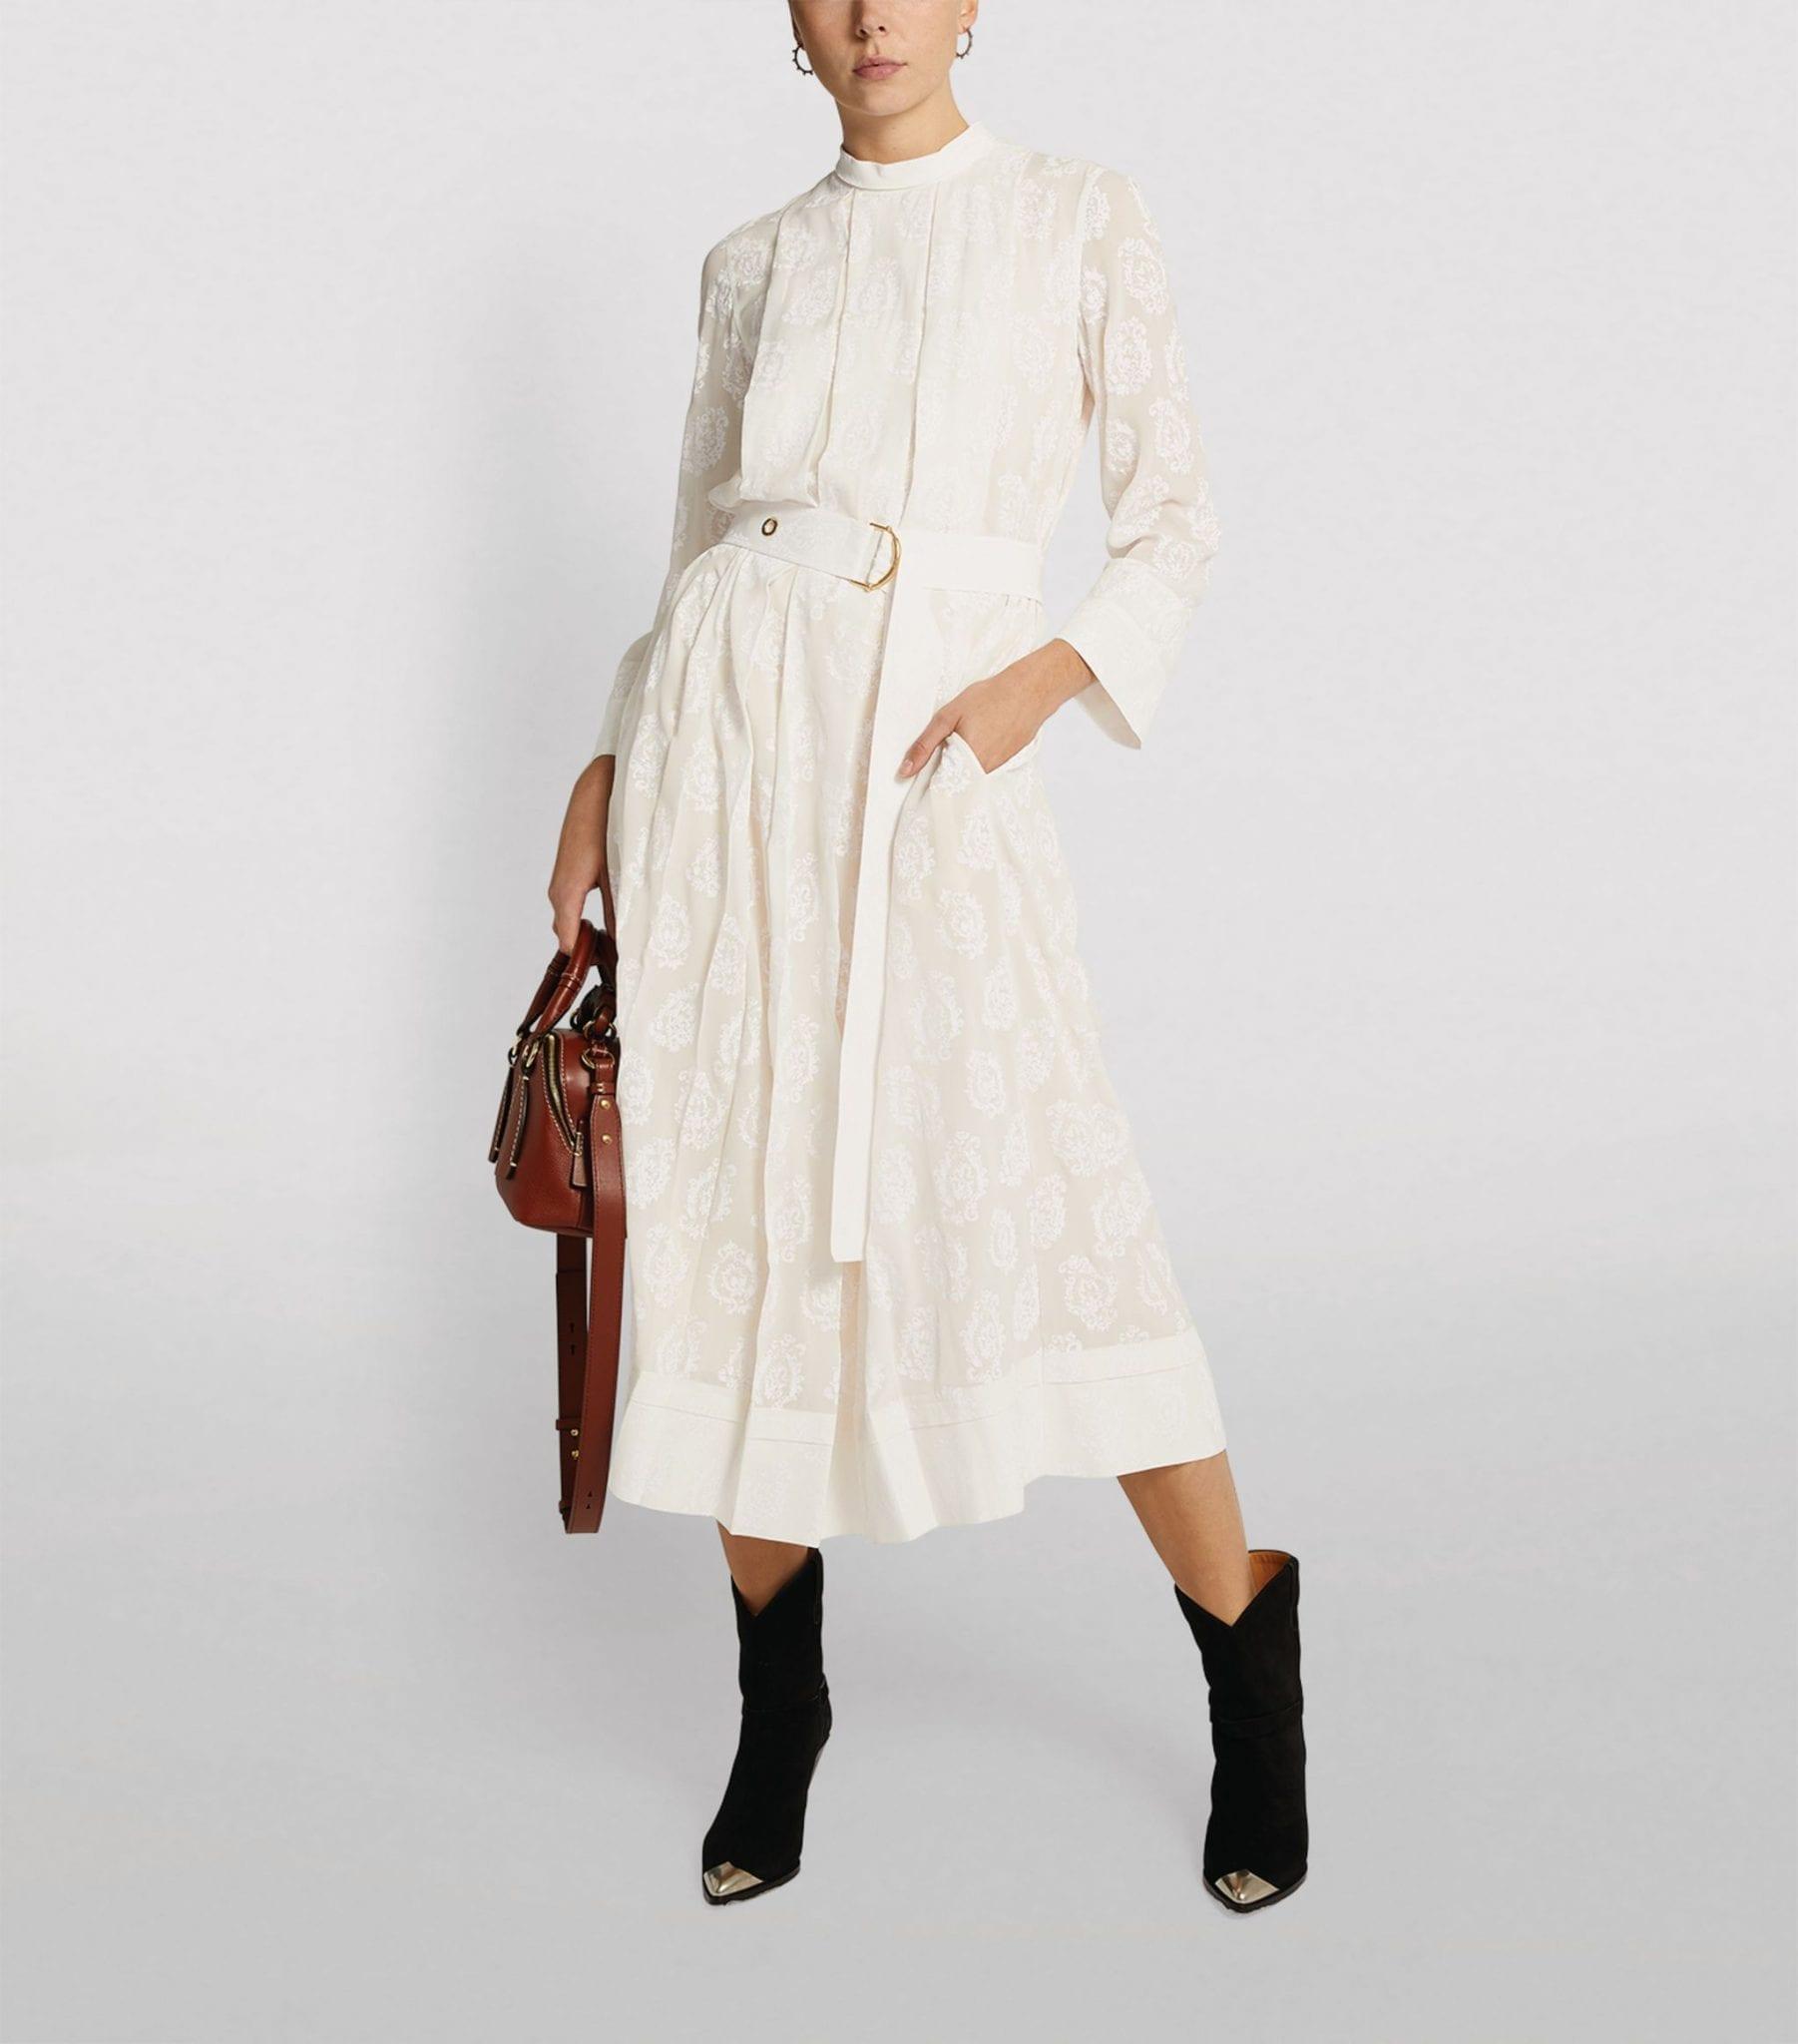 CHLOÉ Silk Embroidered Dress